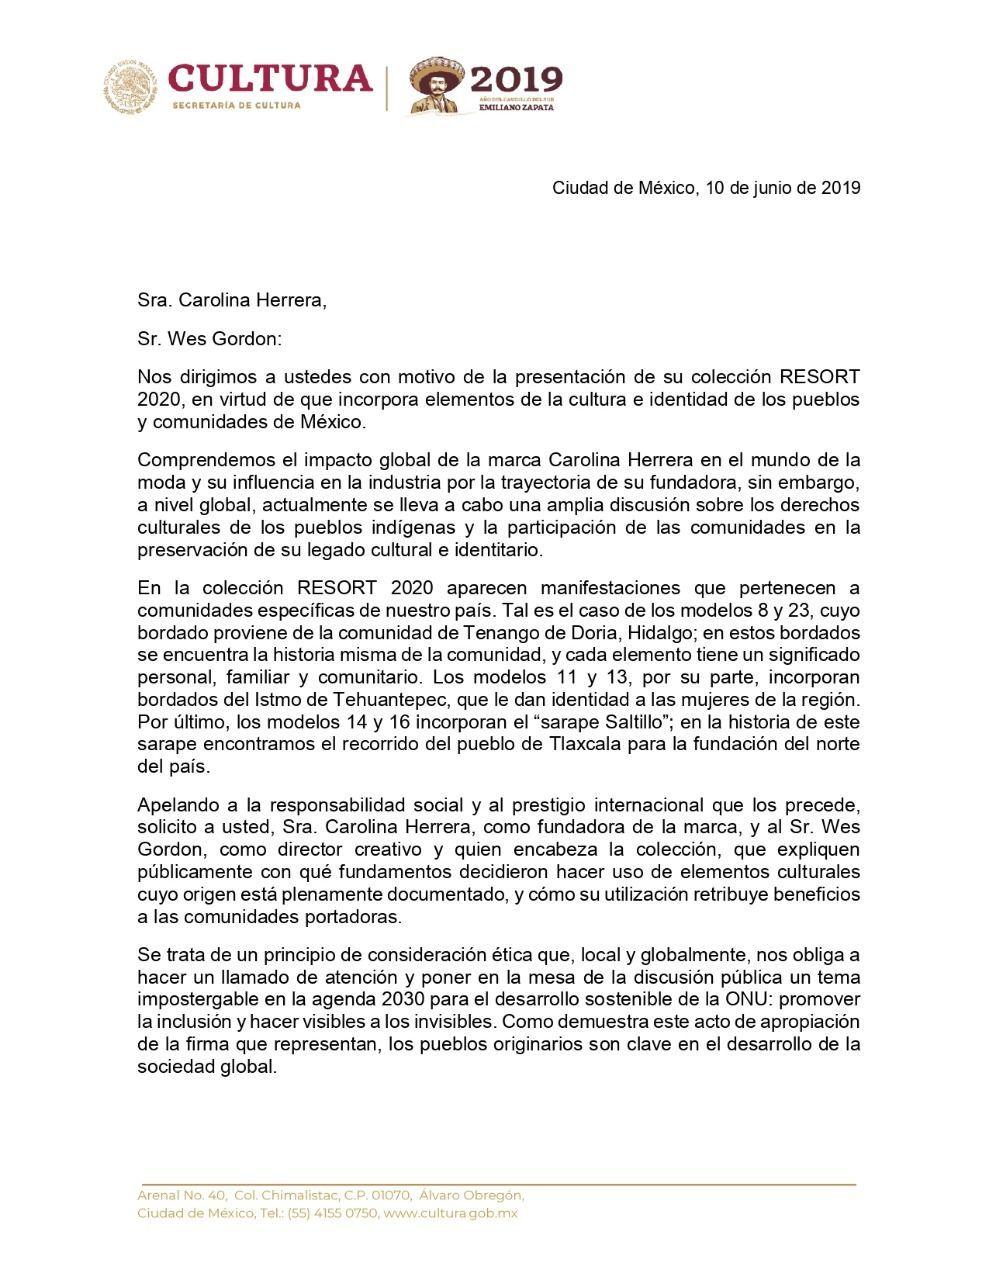 La carta de Carolina Herrera